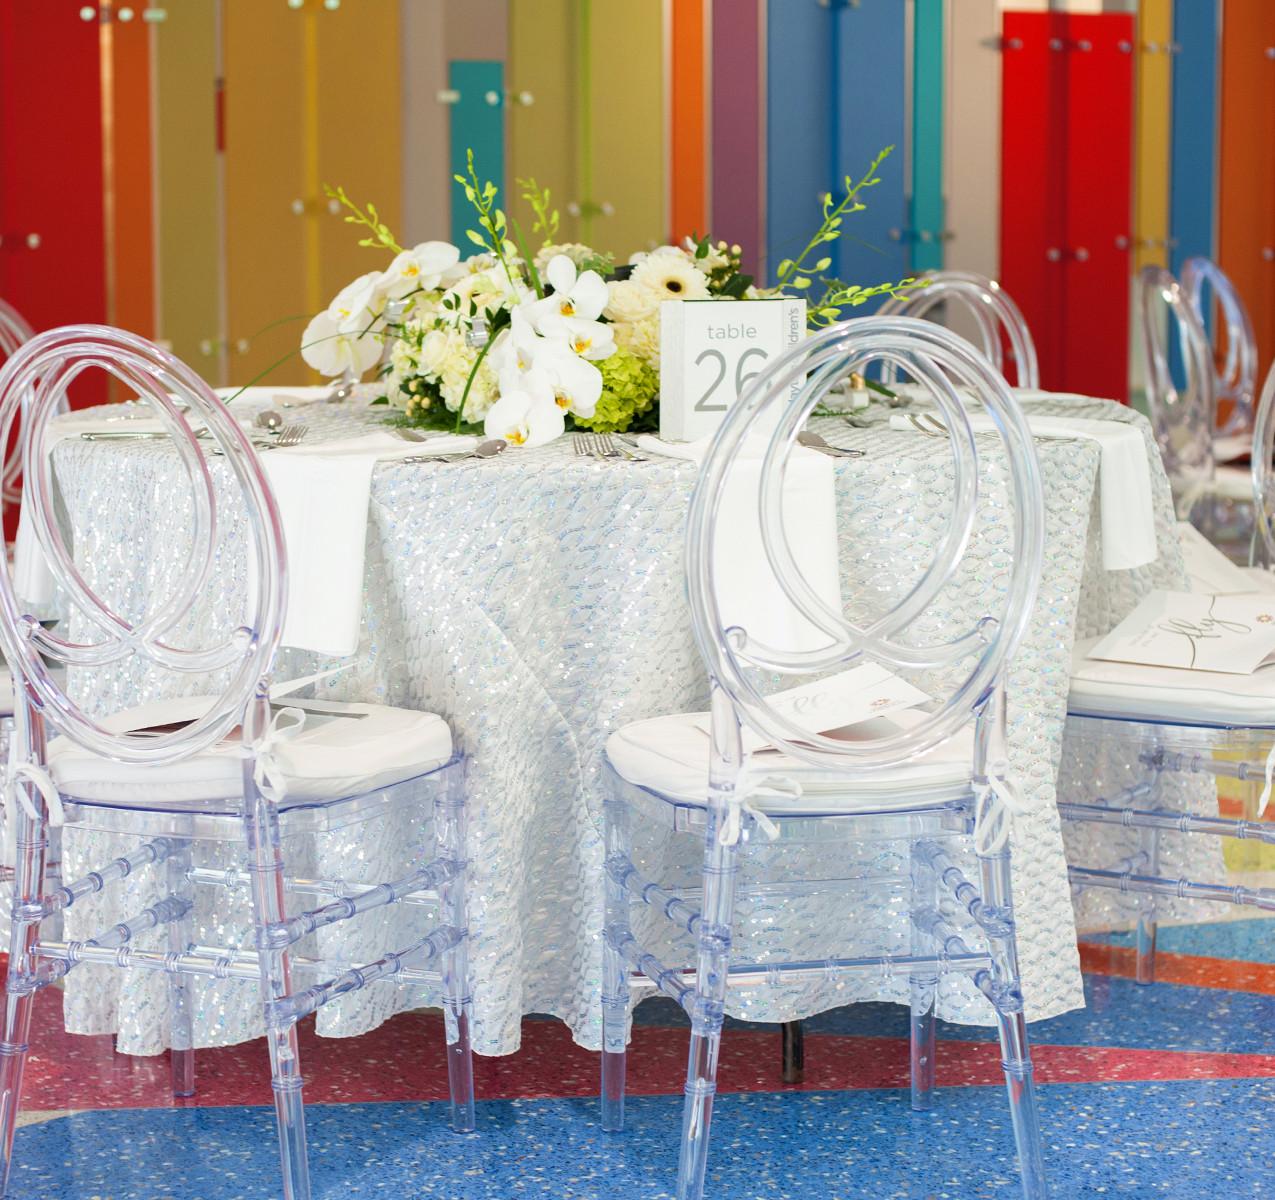 Clear phoenix ghost chair fundraising event decor rental Dayton Cincinnati Ohio 001